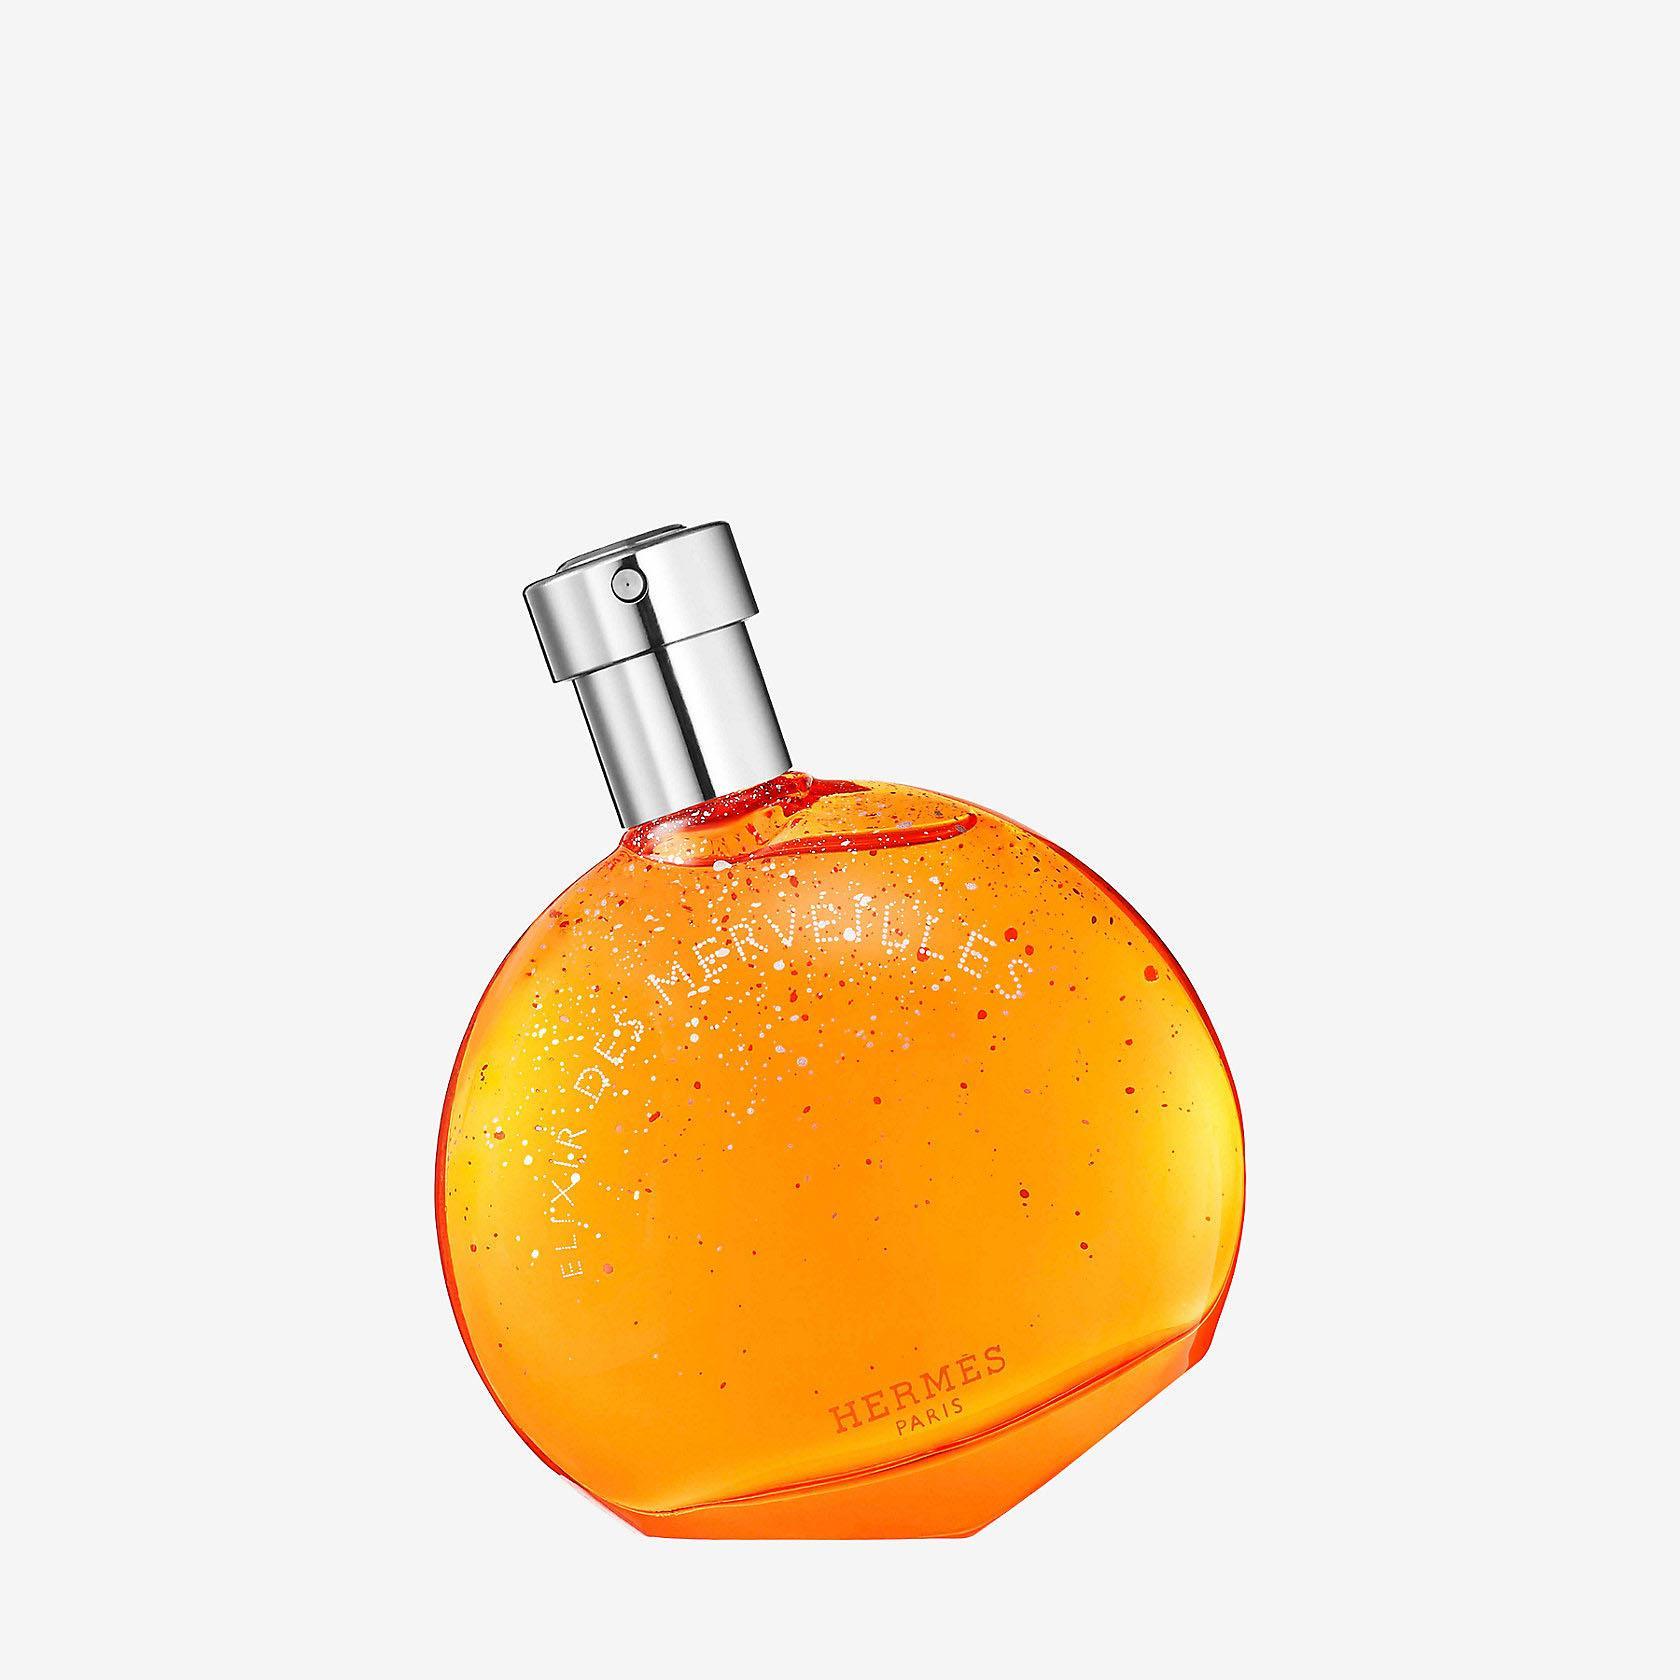 Perfume Elixir Des Merveilles de Hermès . Perfume Elixir Des Merveilles, de Hermès